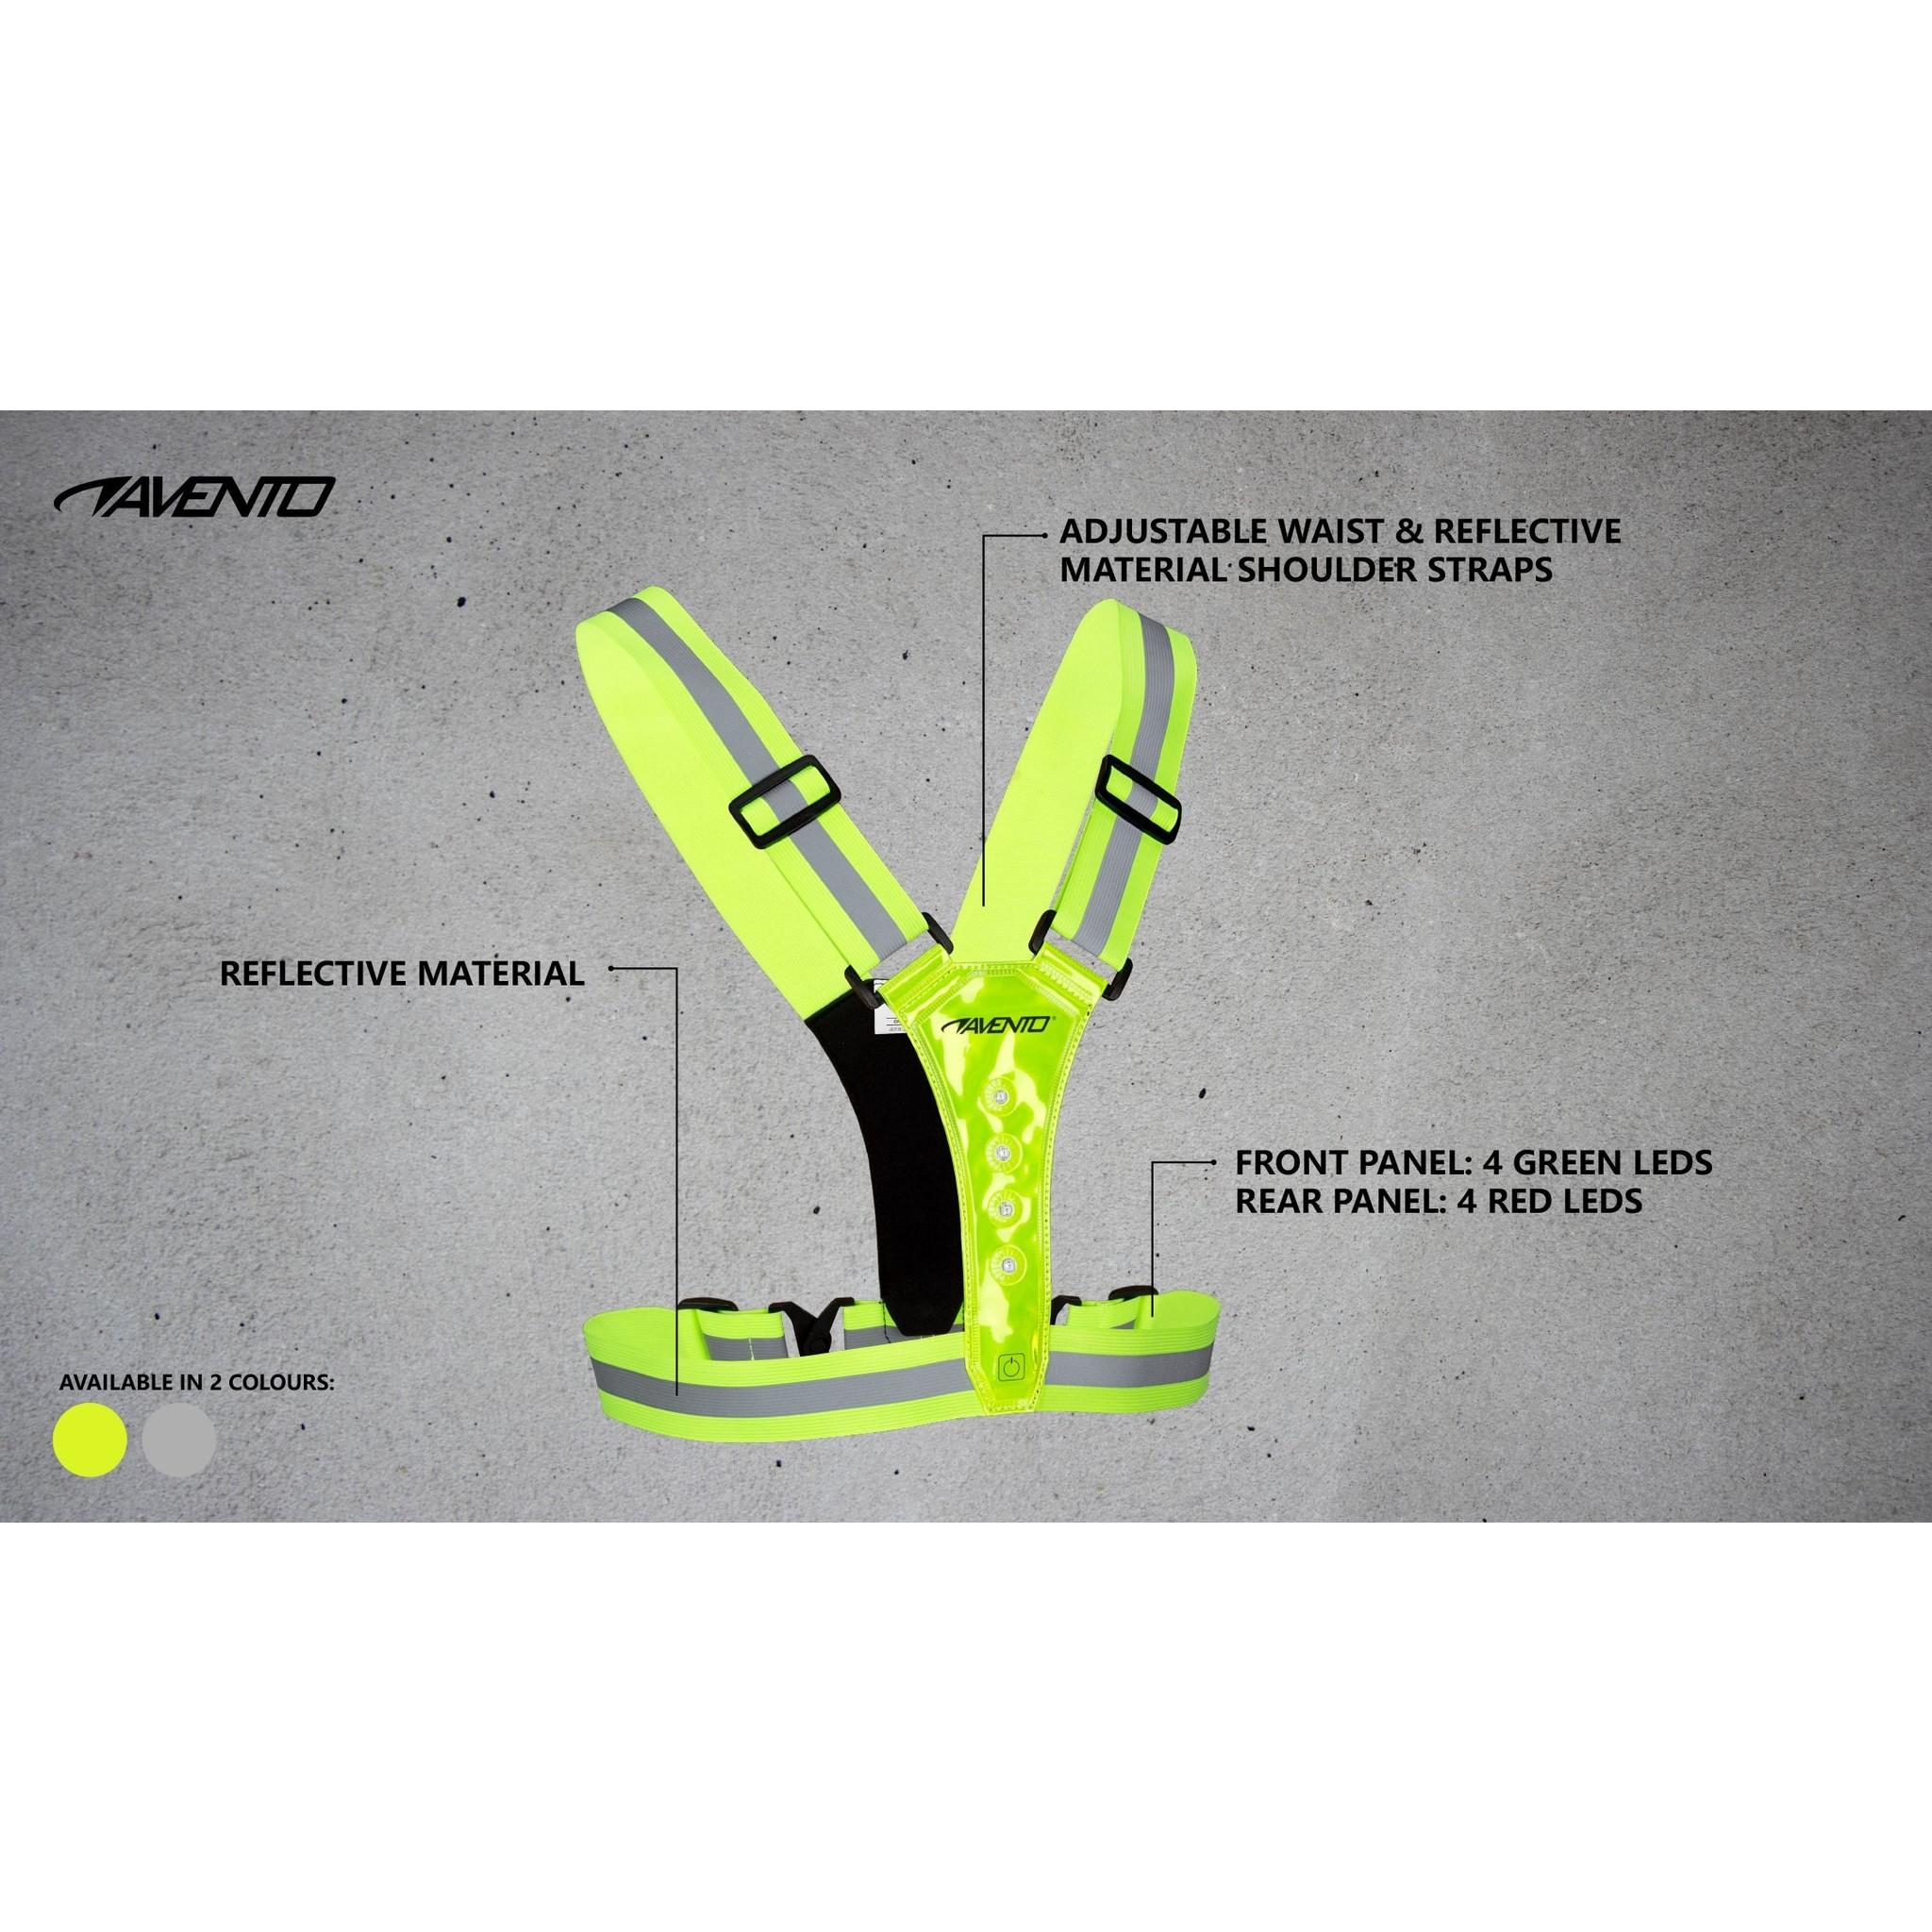 Avento® Hardloop Veiligheidsvest Reflecterend met LED's